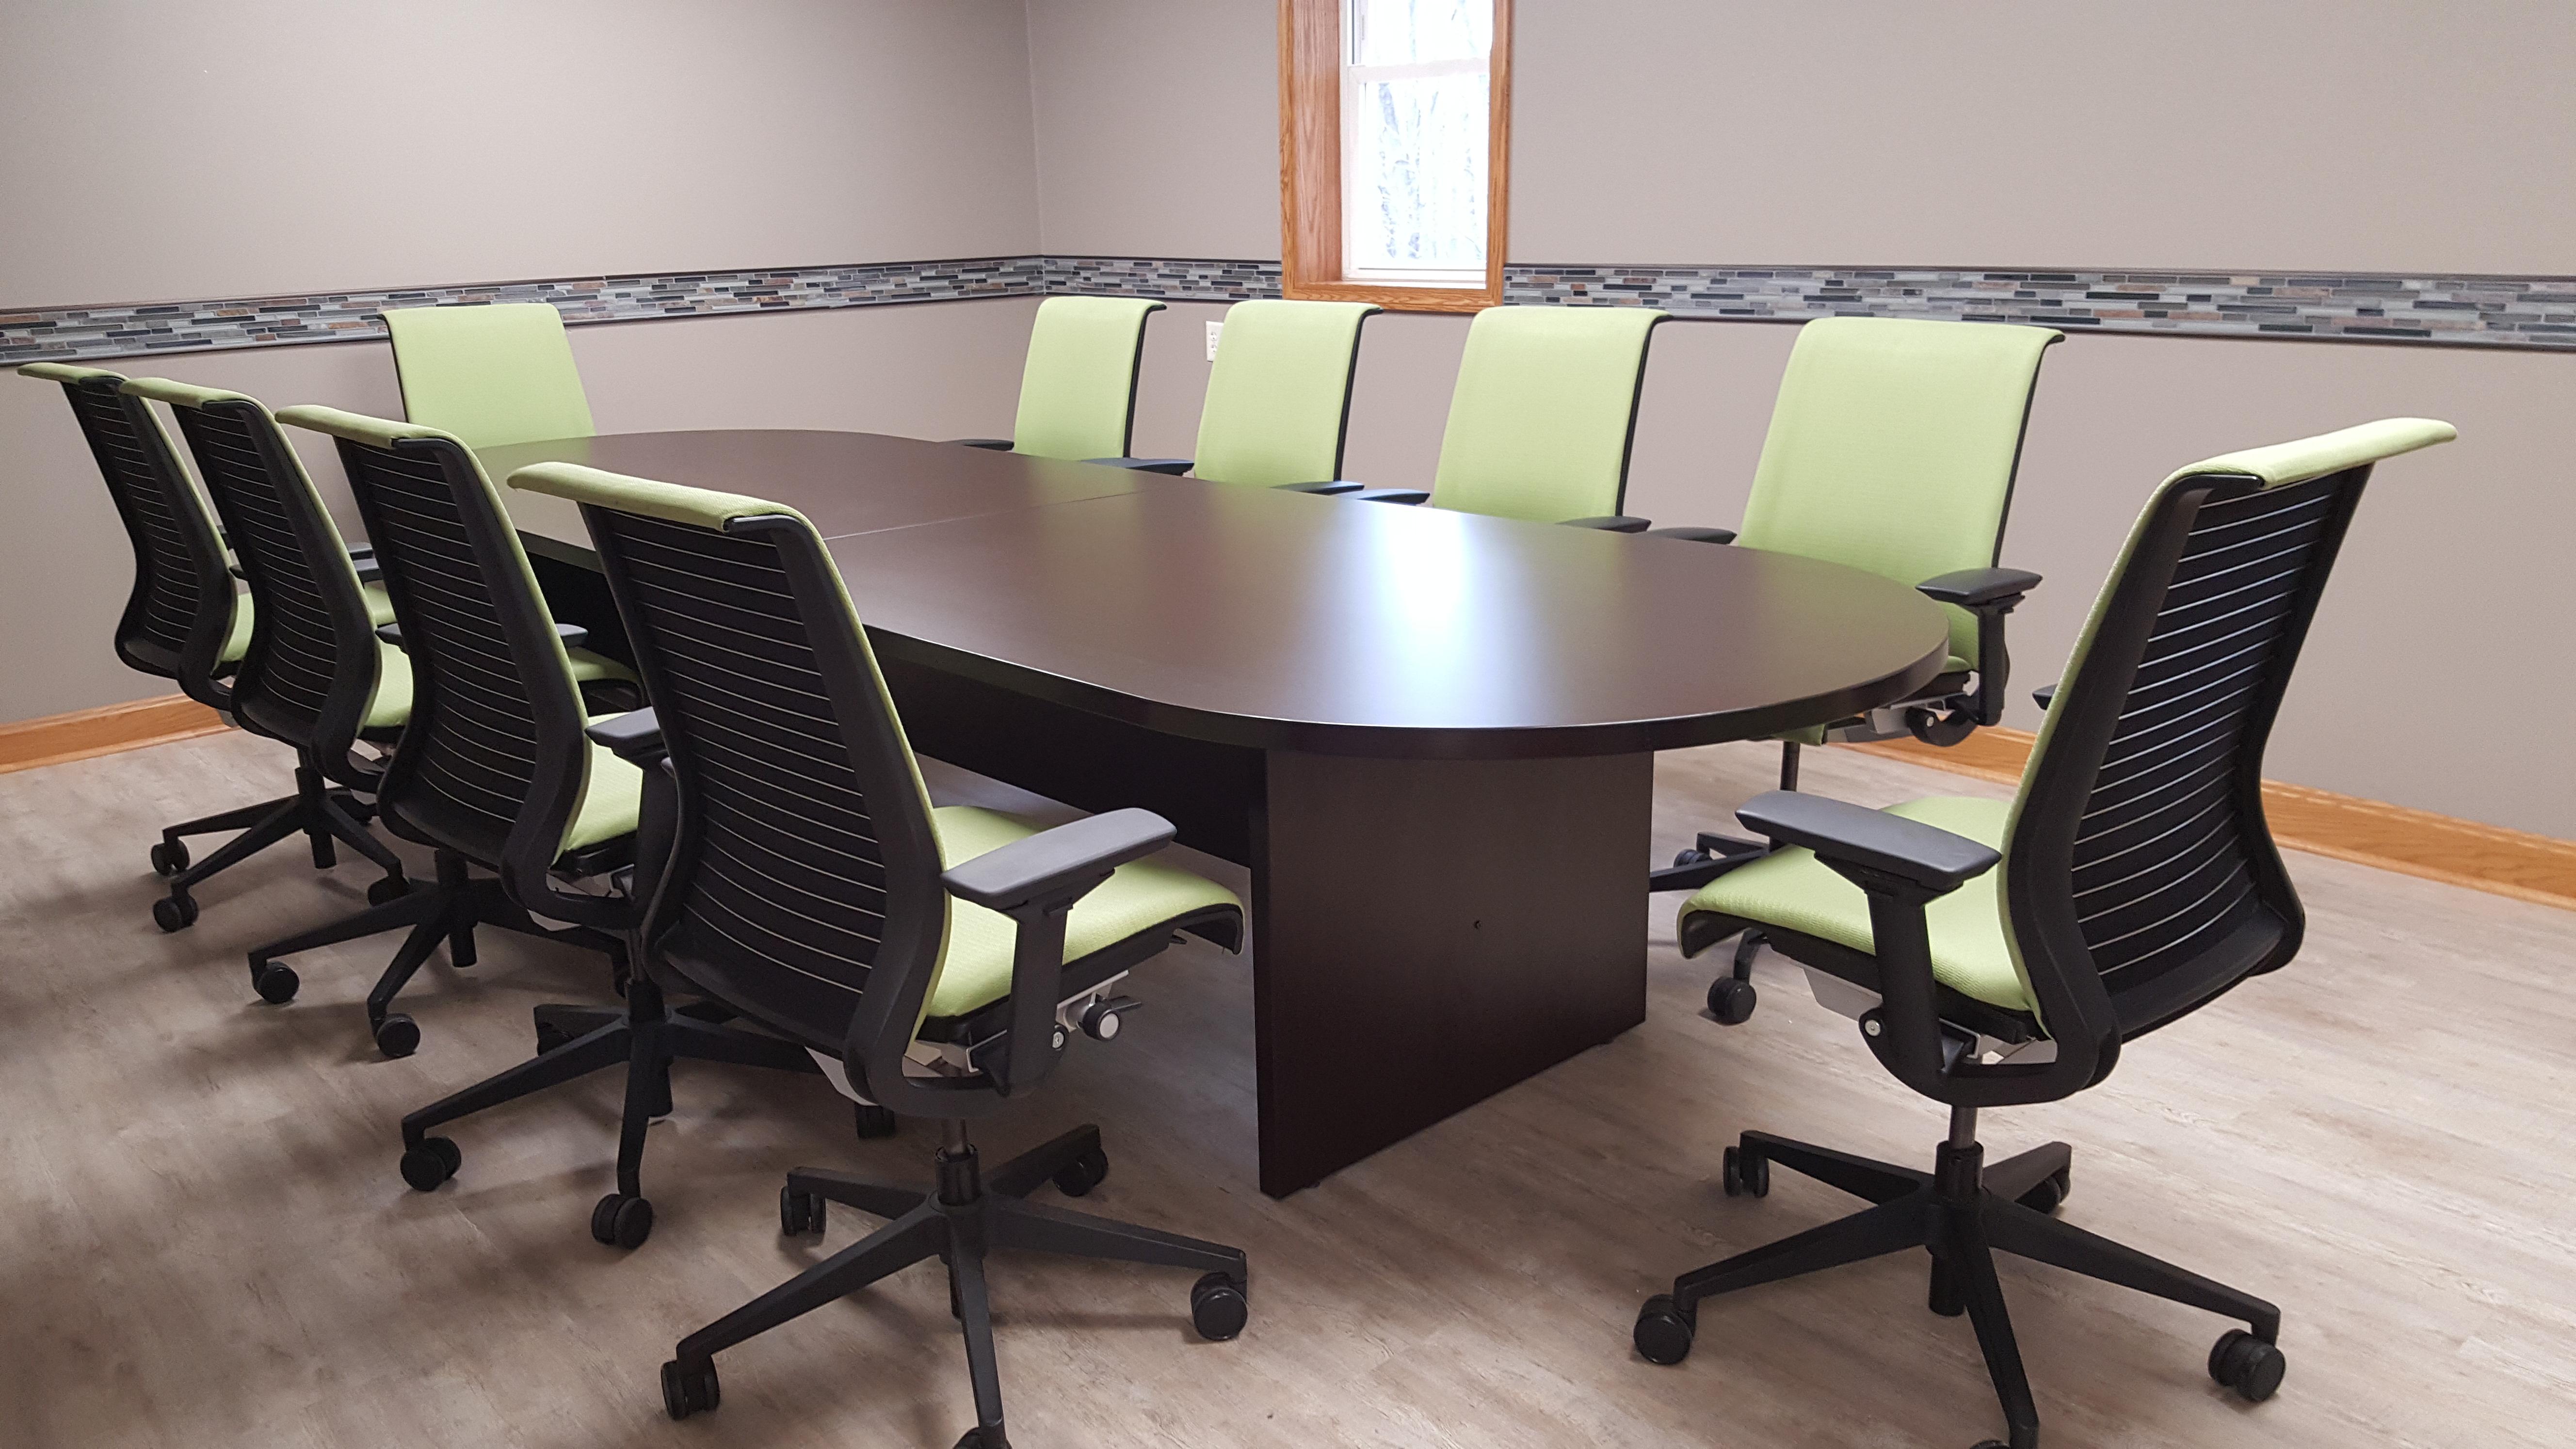 tour fices houston of stellar mega elegant office dallas used desks luxury furniture tx fice ideas amazing